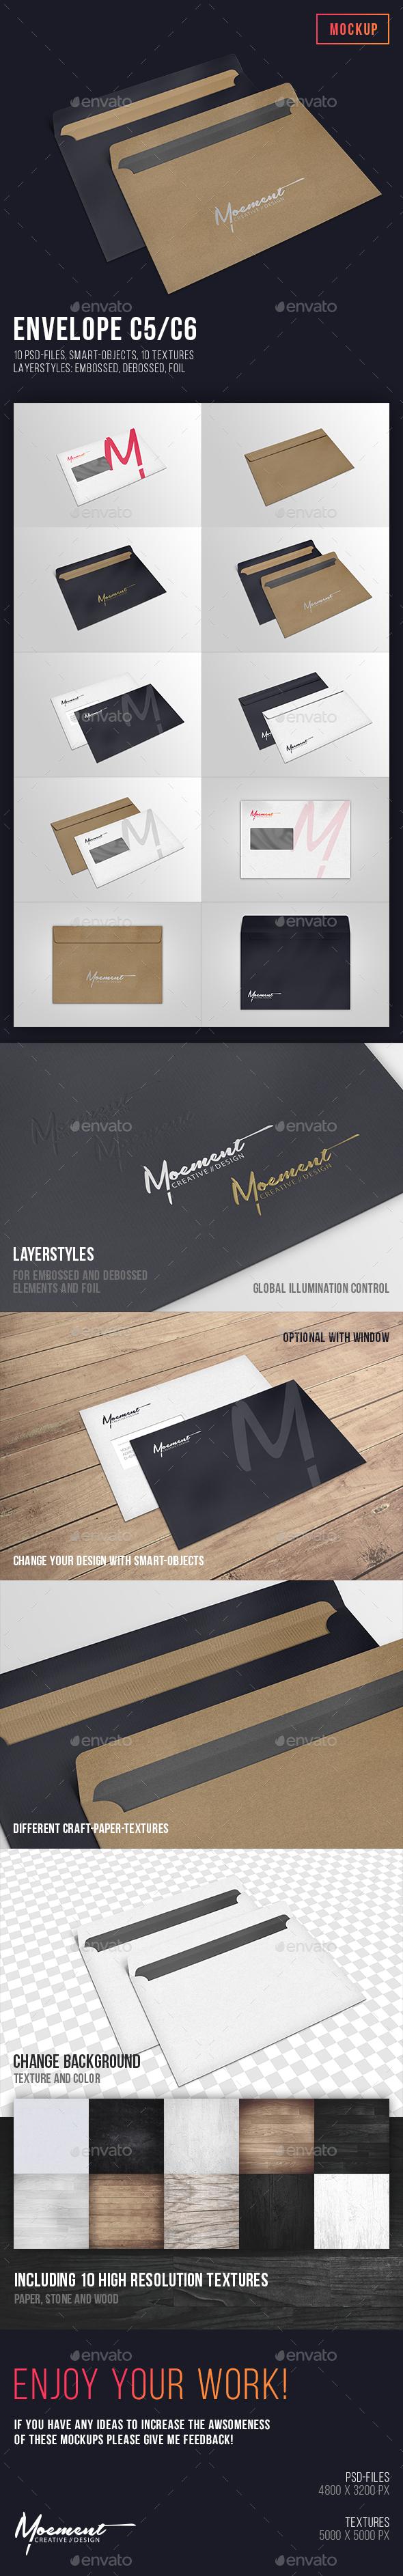 Envelope C5/C6 Mockup - Stationery Print